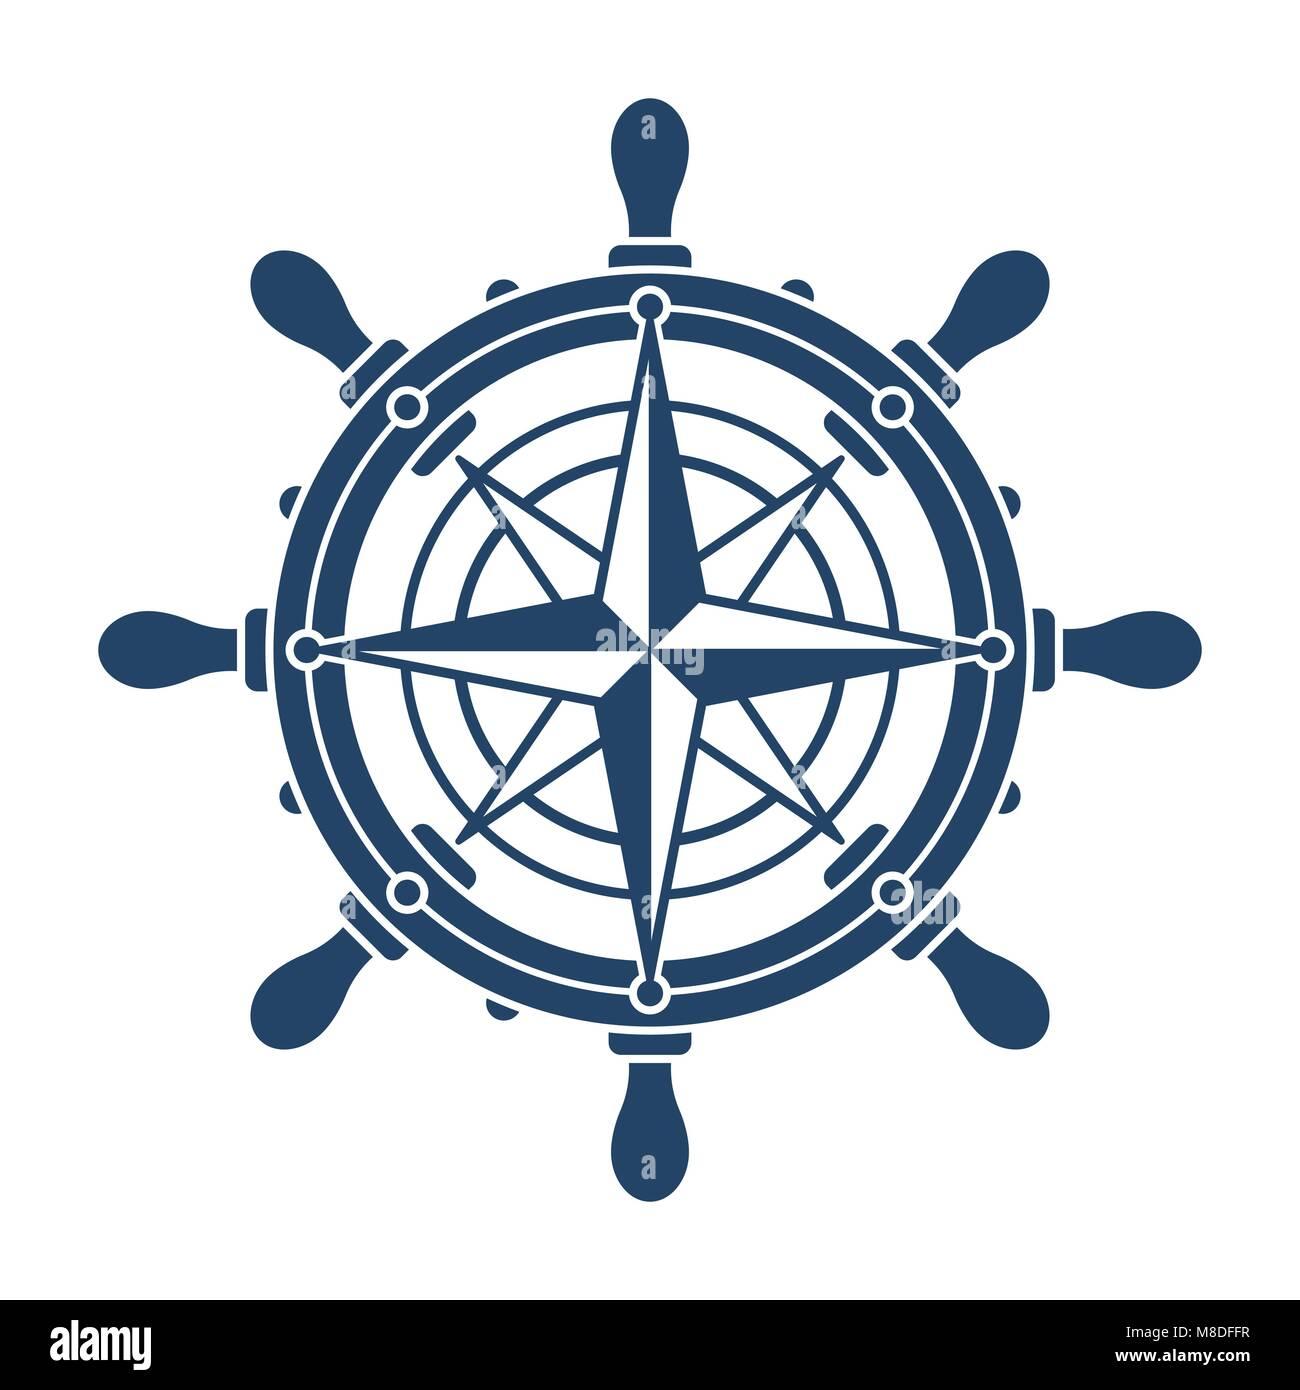 Steuerrad Symbol